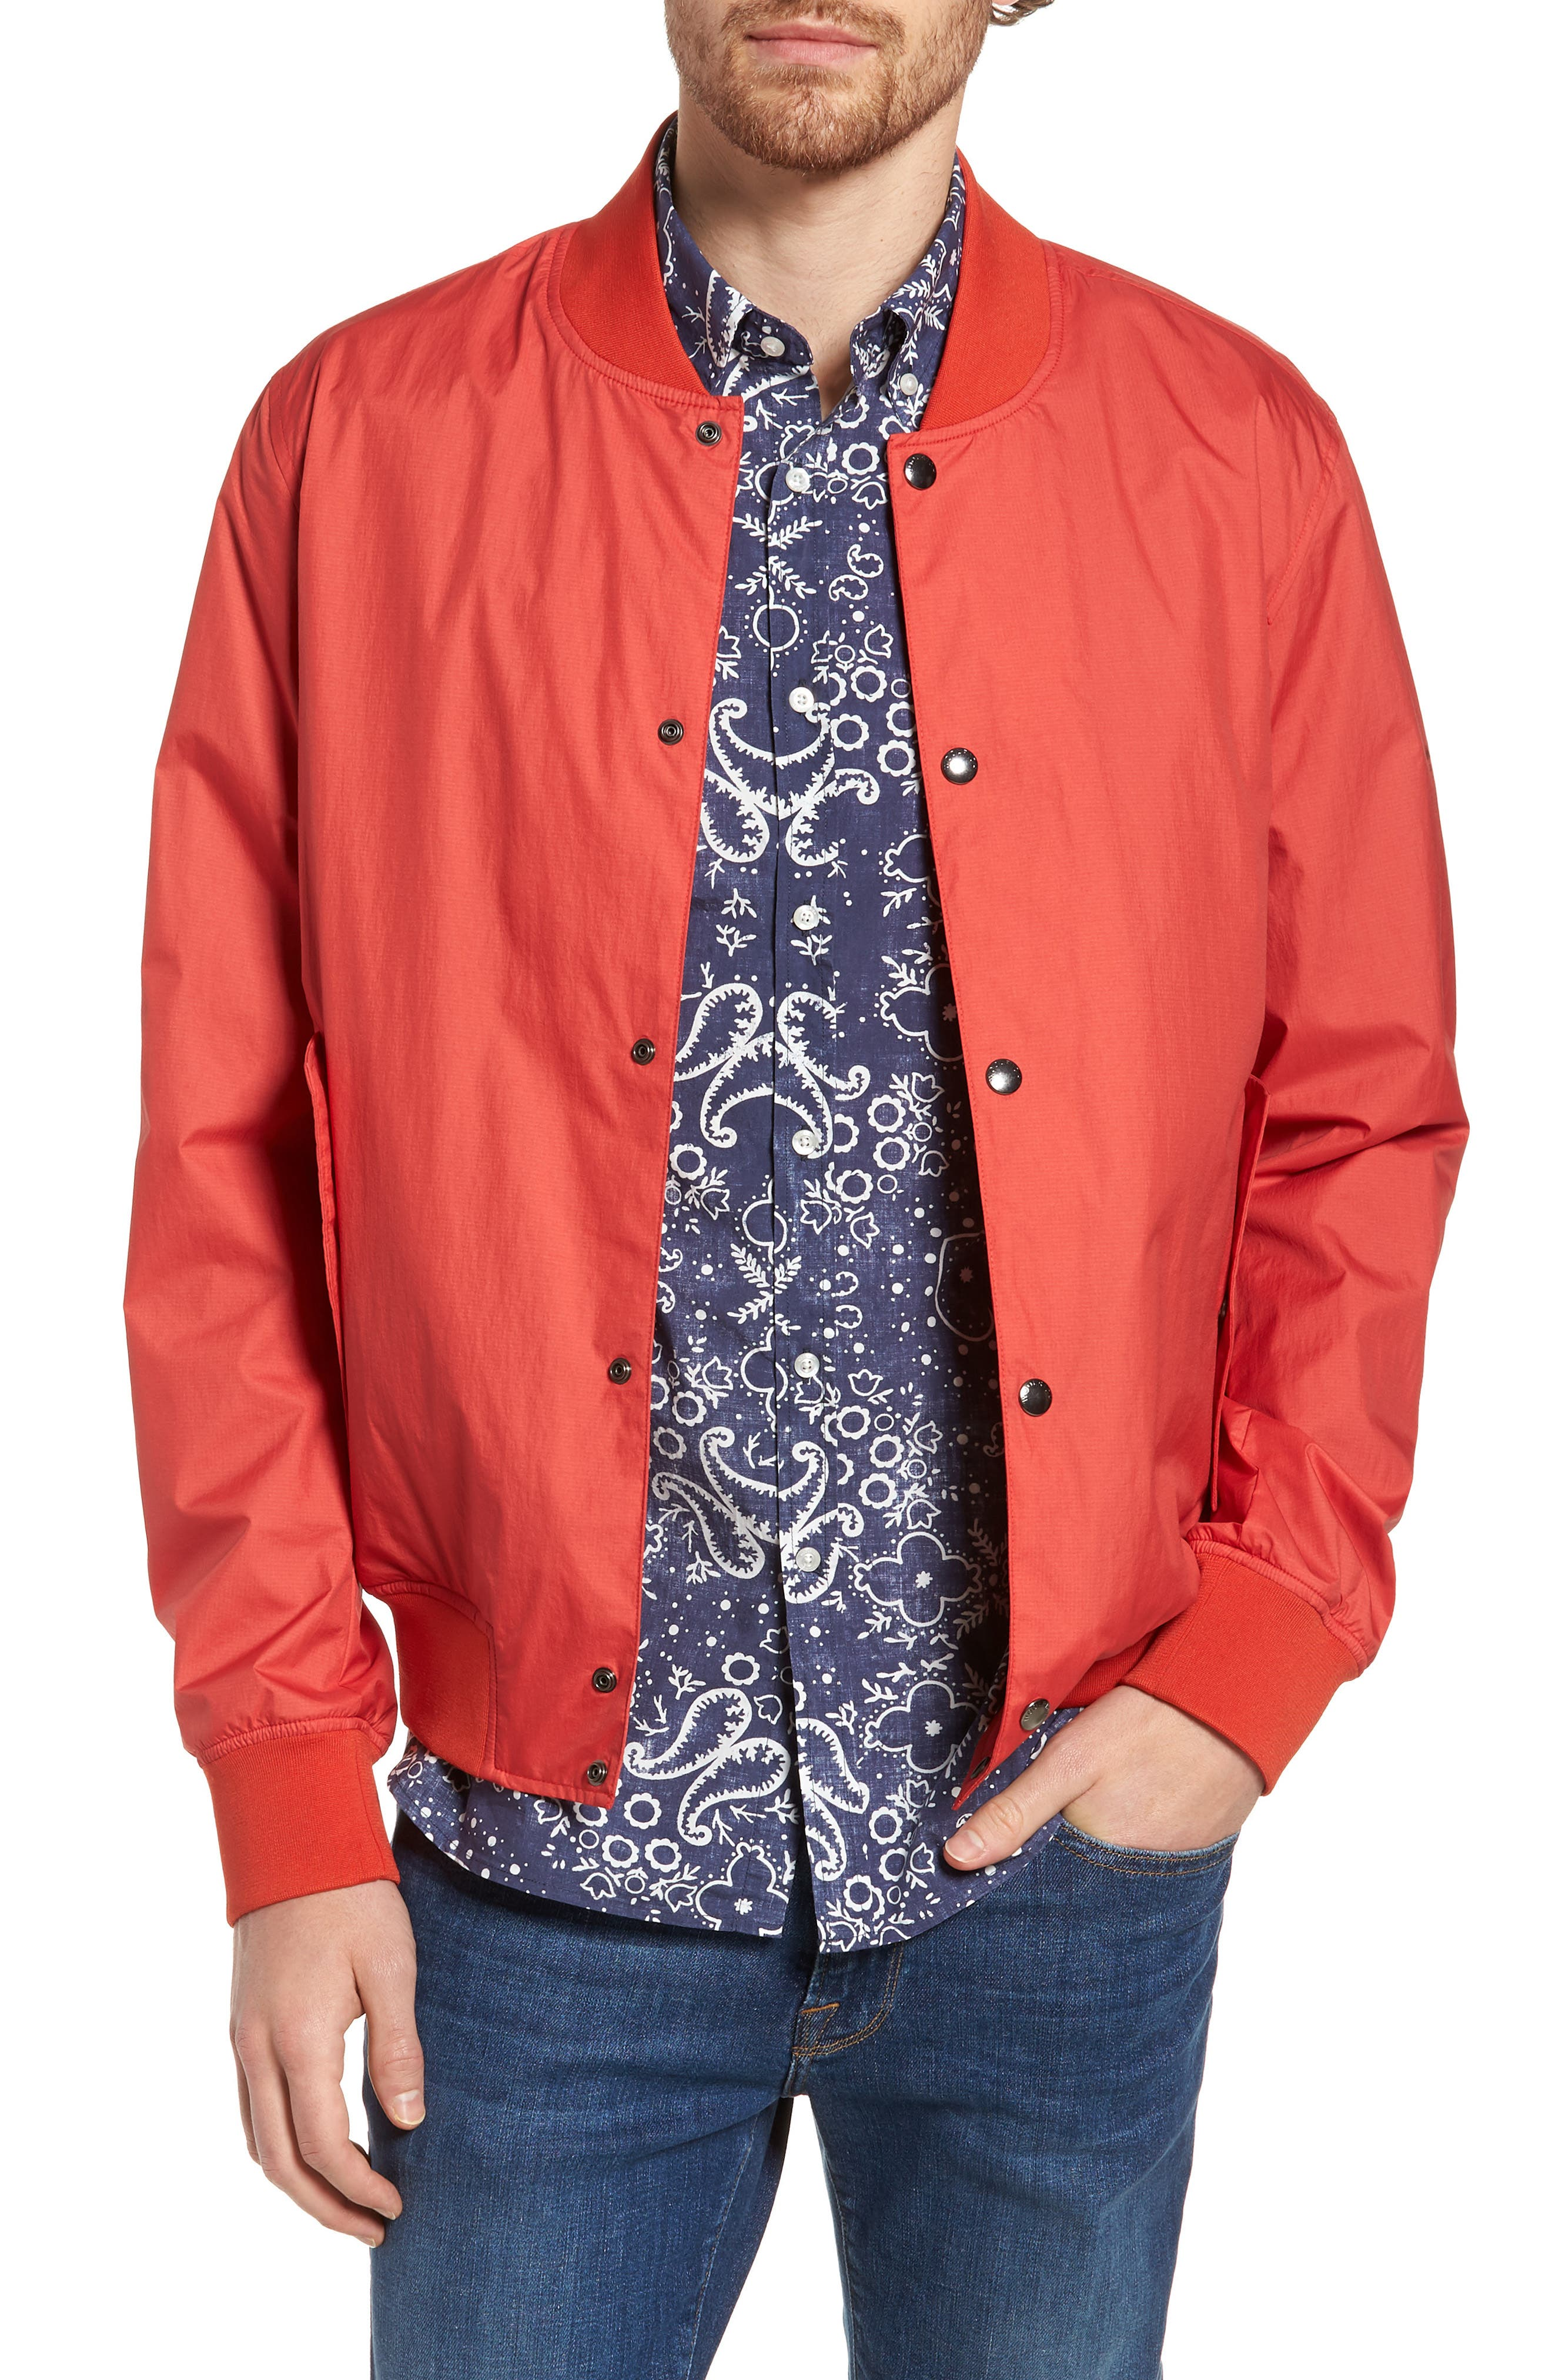 Wallaby Bomber Jacket,                         Main,                         color, 646